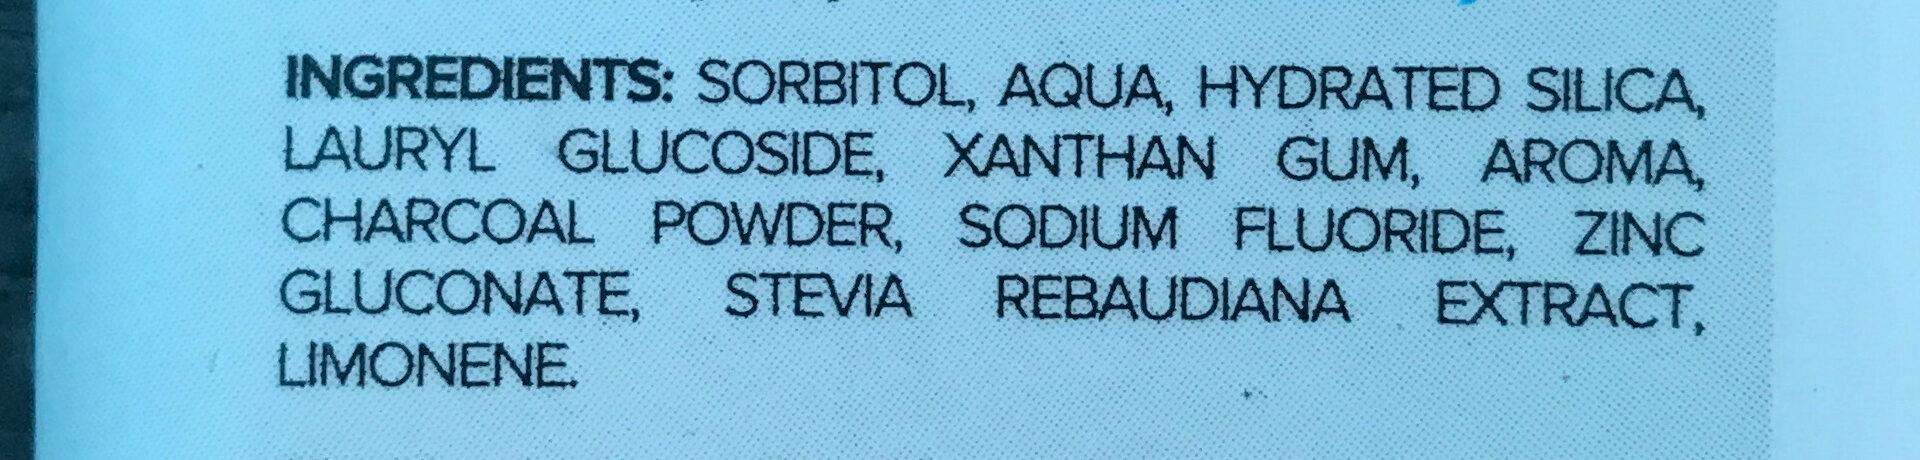 Natural Toothpaste - Ingredients